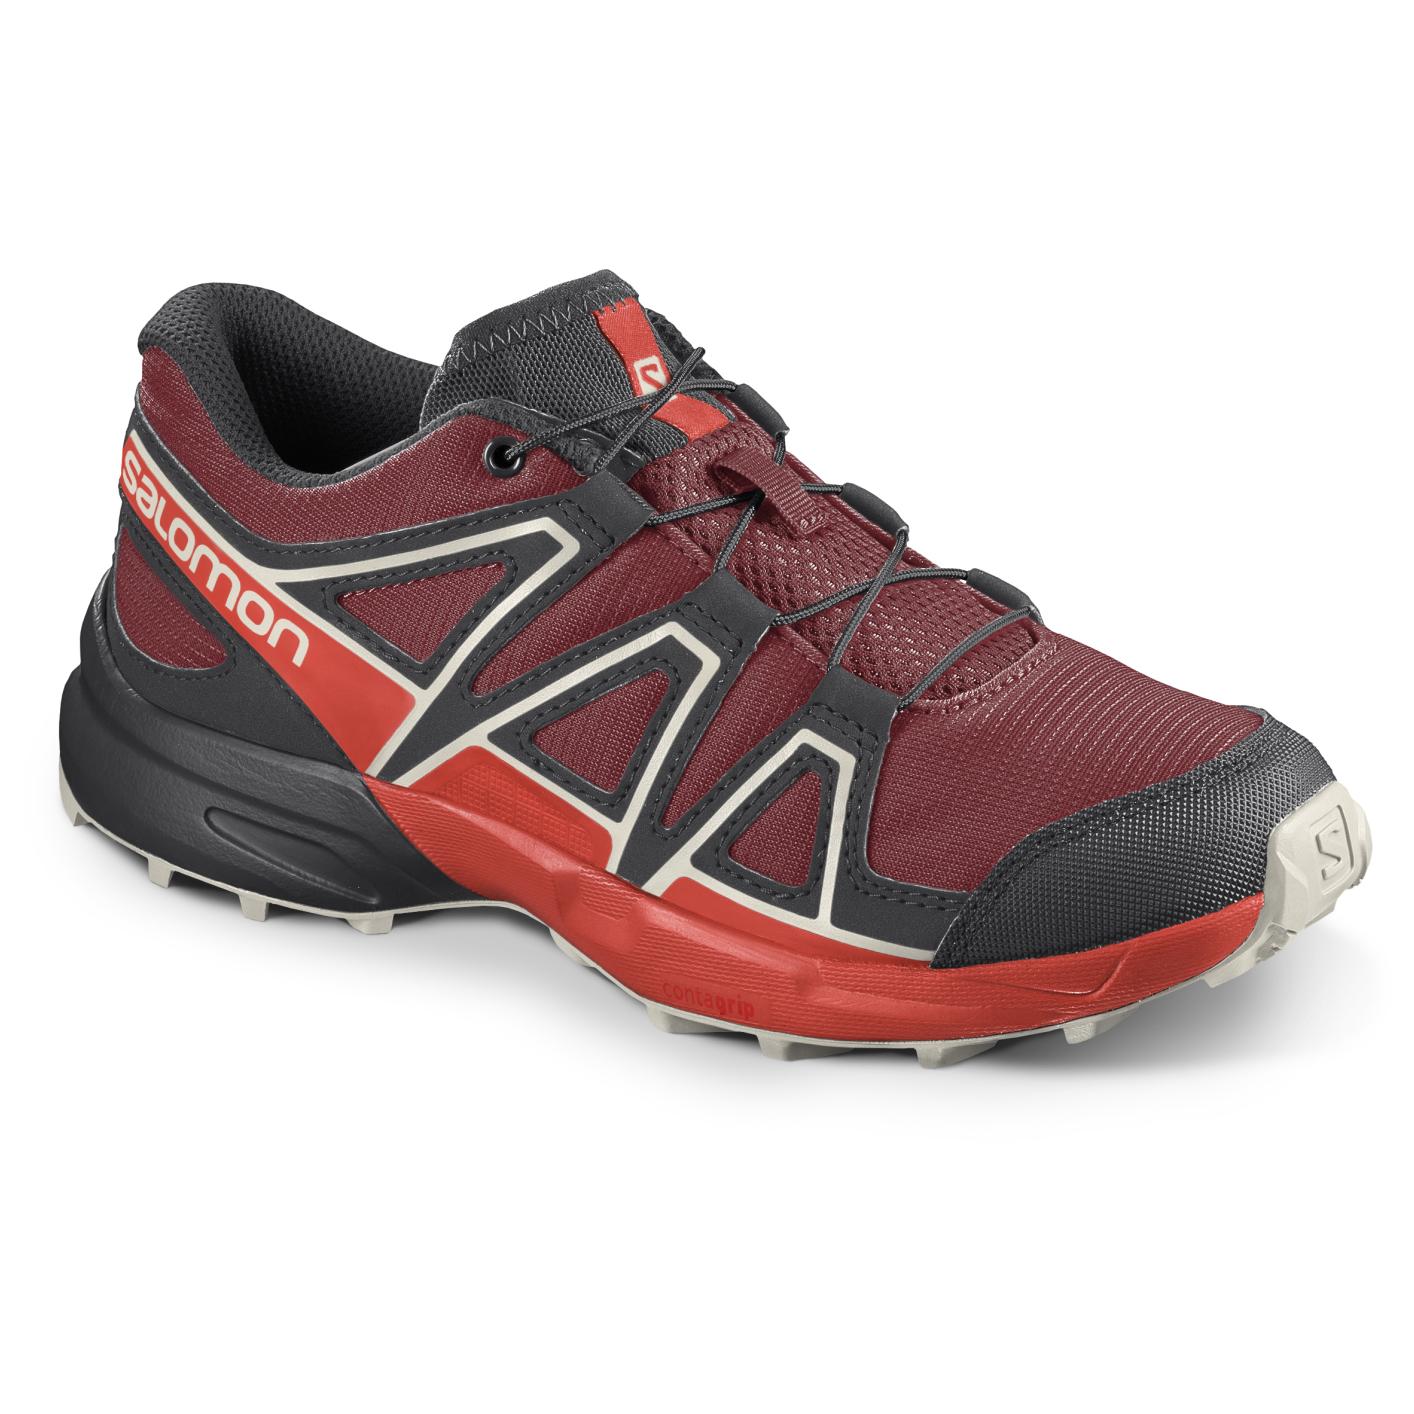 Salomon Speedcross - Trail running